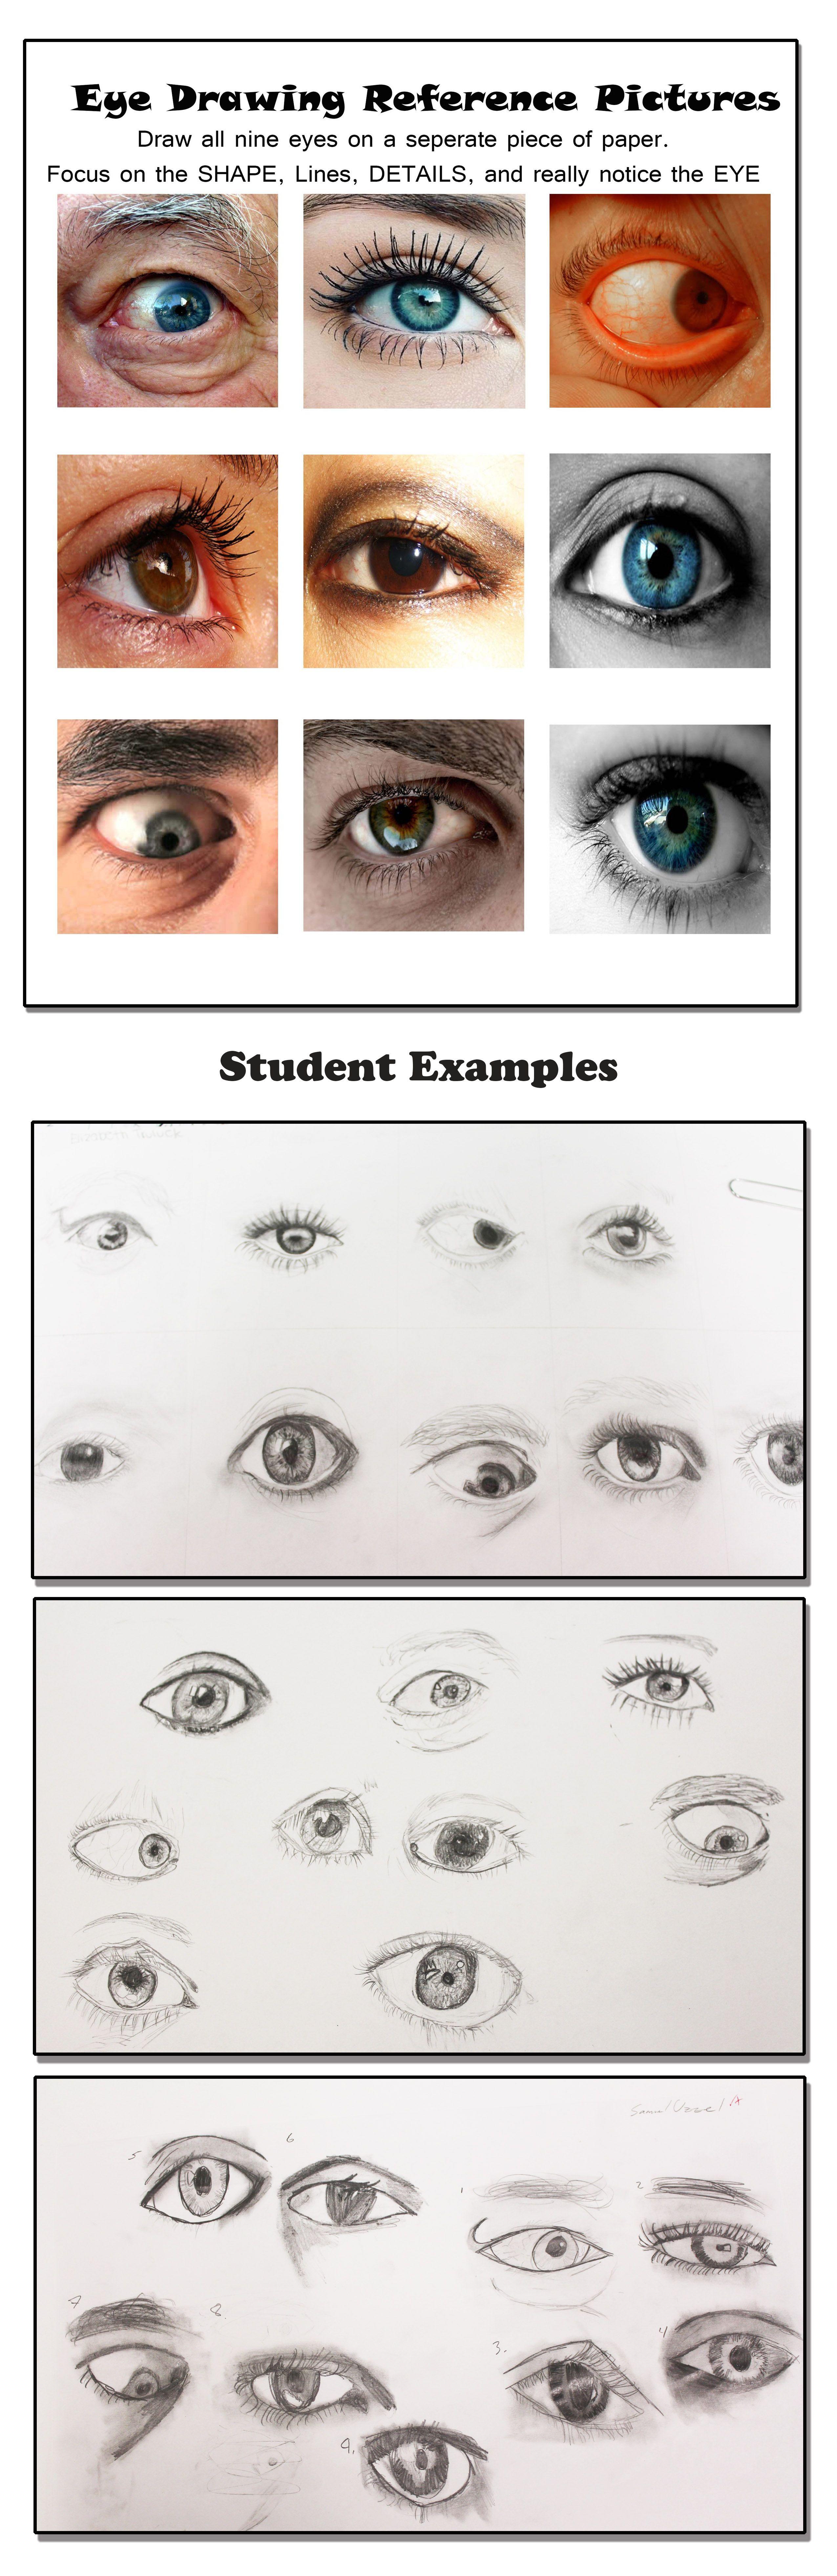 Art 1 Eye Drawings Learning To Draw The Eye Worksheet